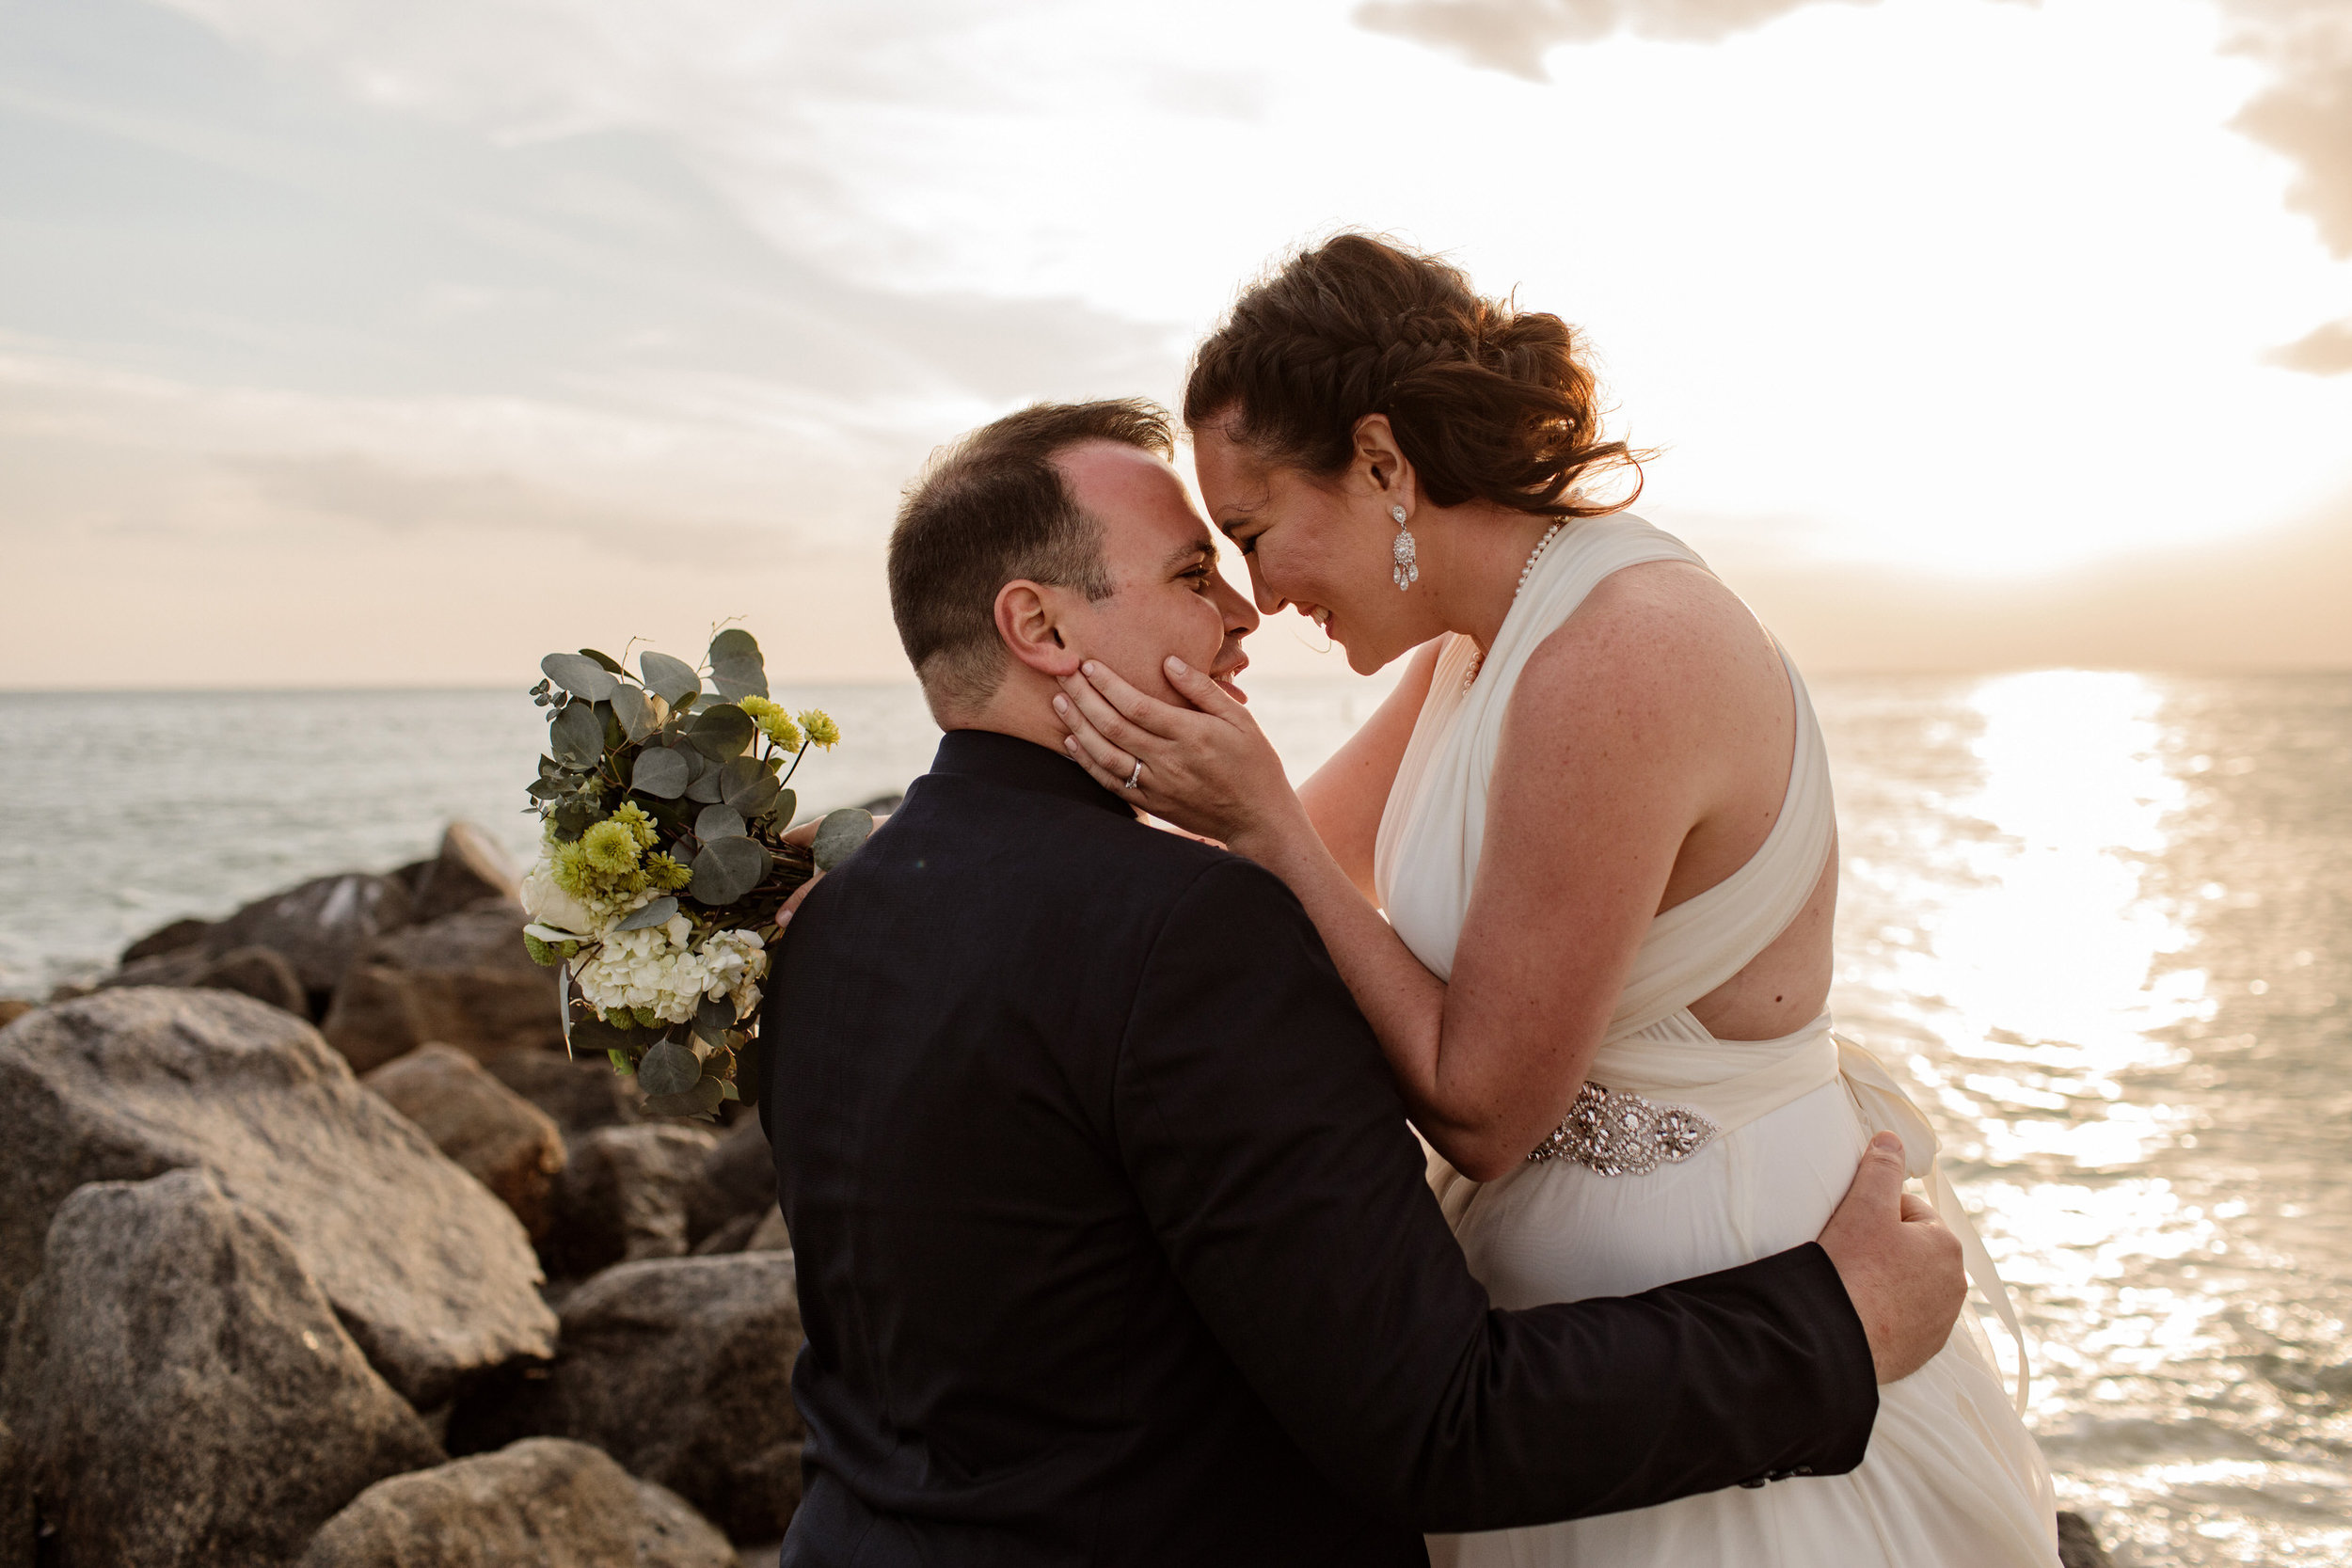 Beltran_Treasure_Island_Elopement_Tampa_Wedding_125-1.jpg